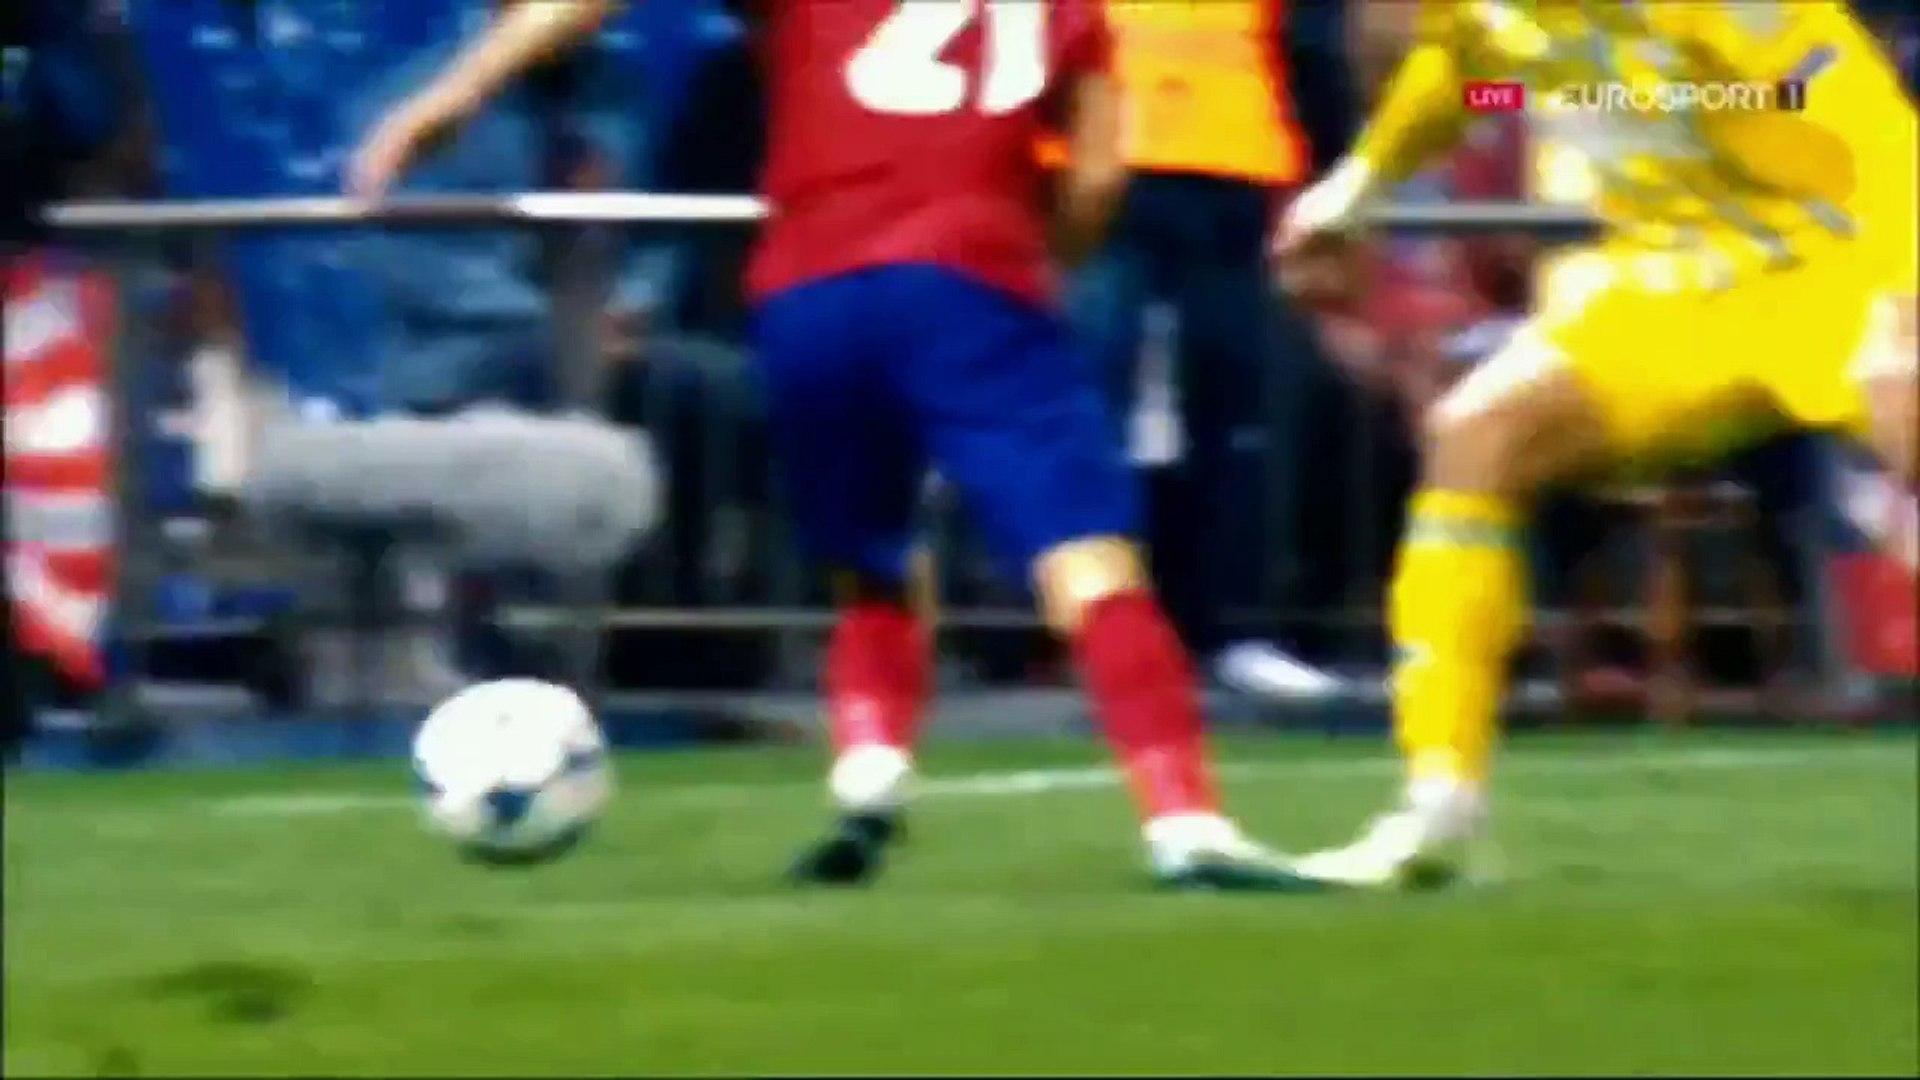 Лига Чемпионов УЕФА - Жеребьевка 1-4 (18.03.2016) - Champions League quarter-final draw results